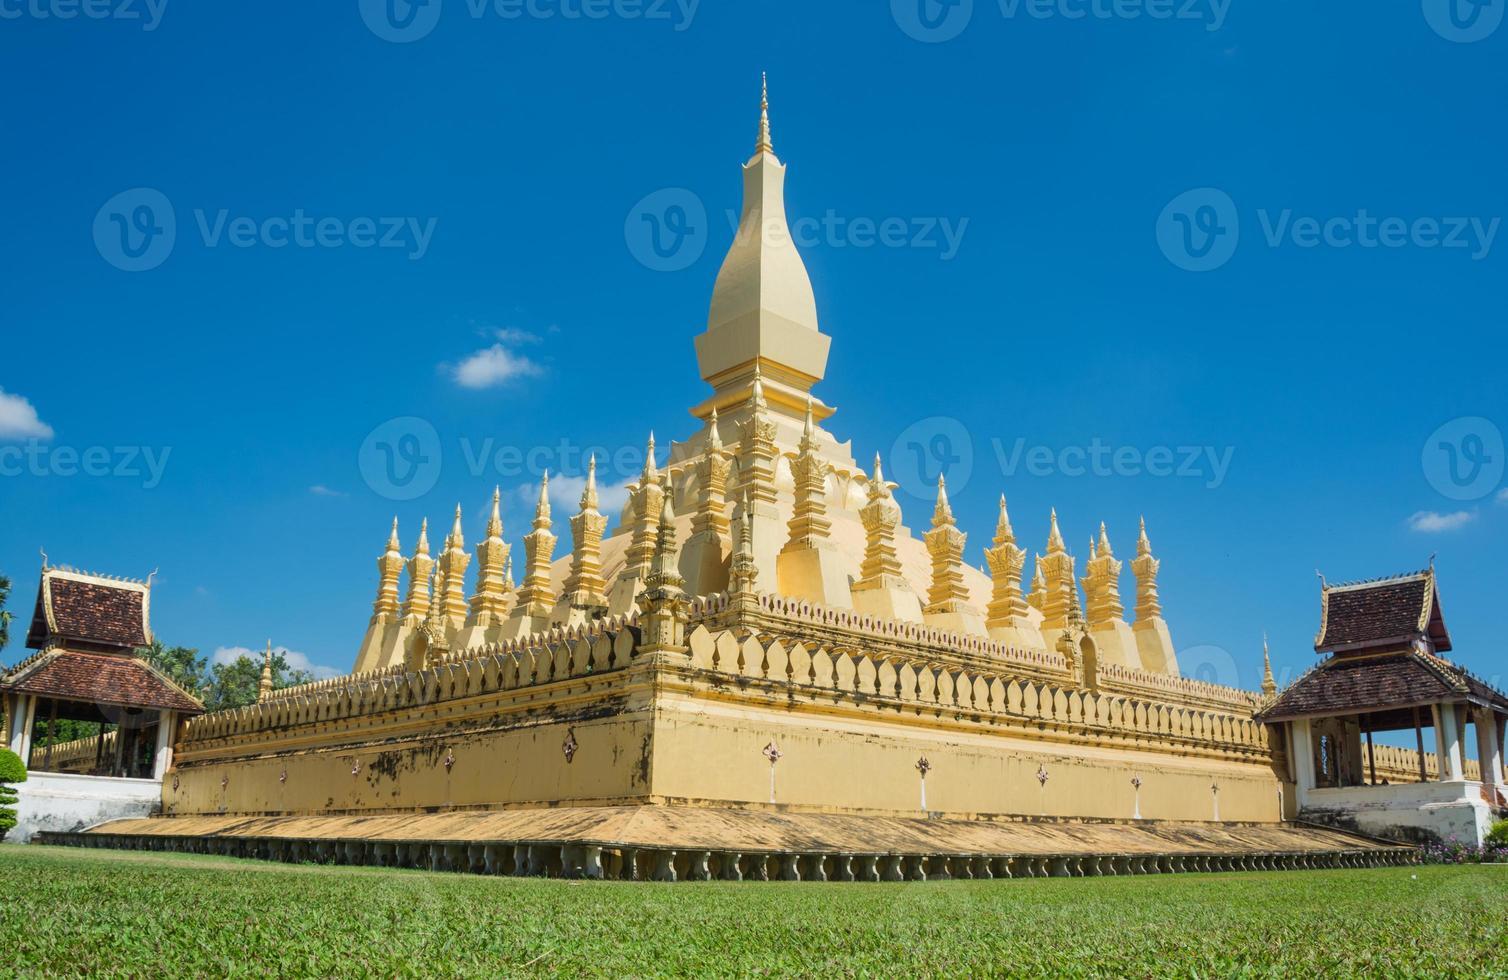 marco de viagens de laos, pagode de ouro wat phra que luang foto